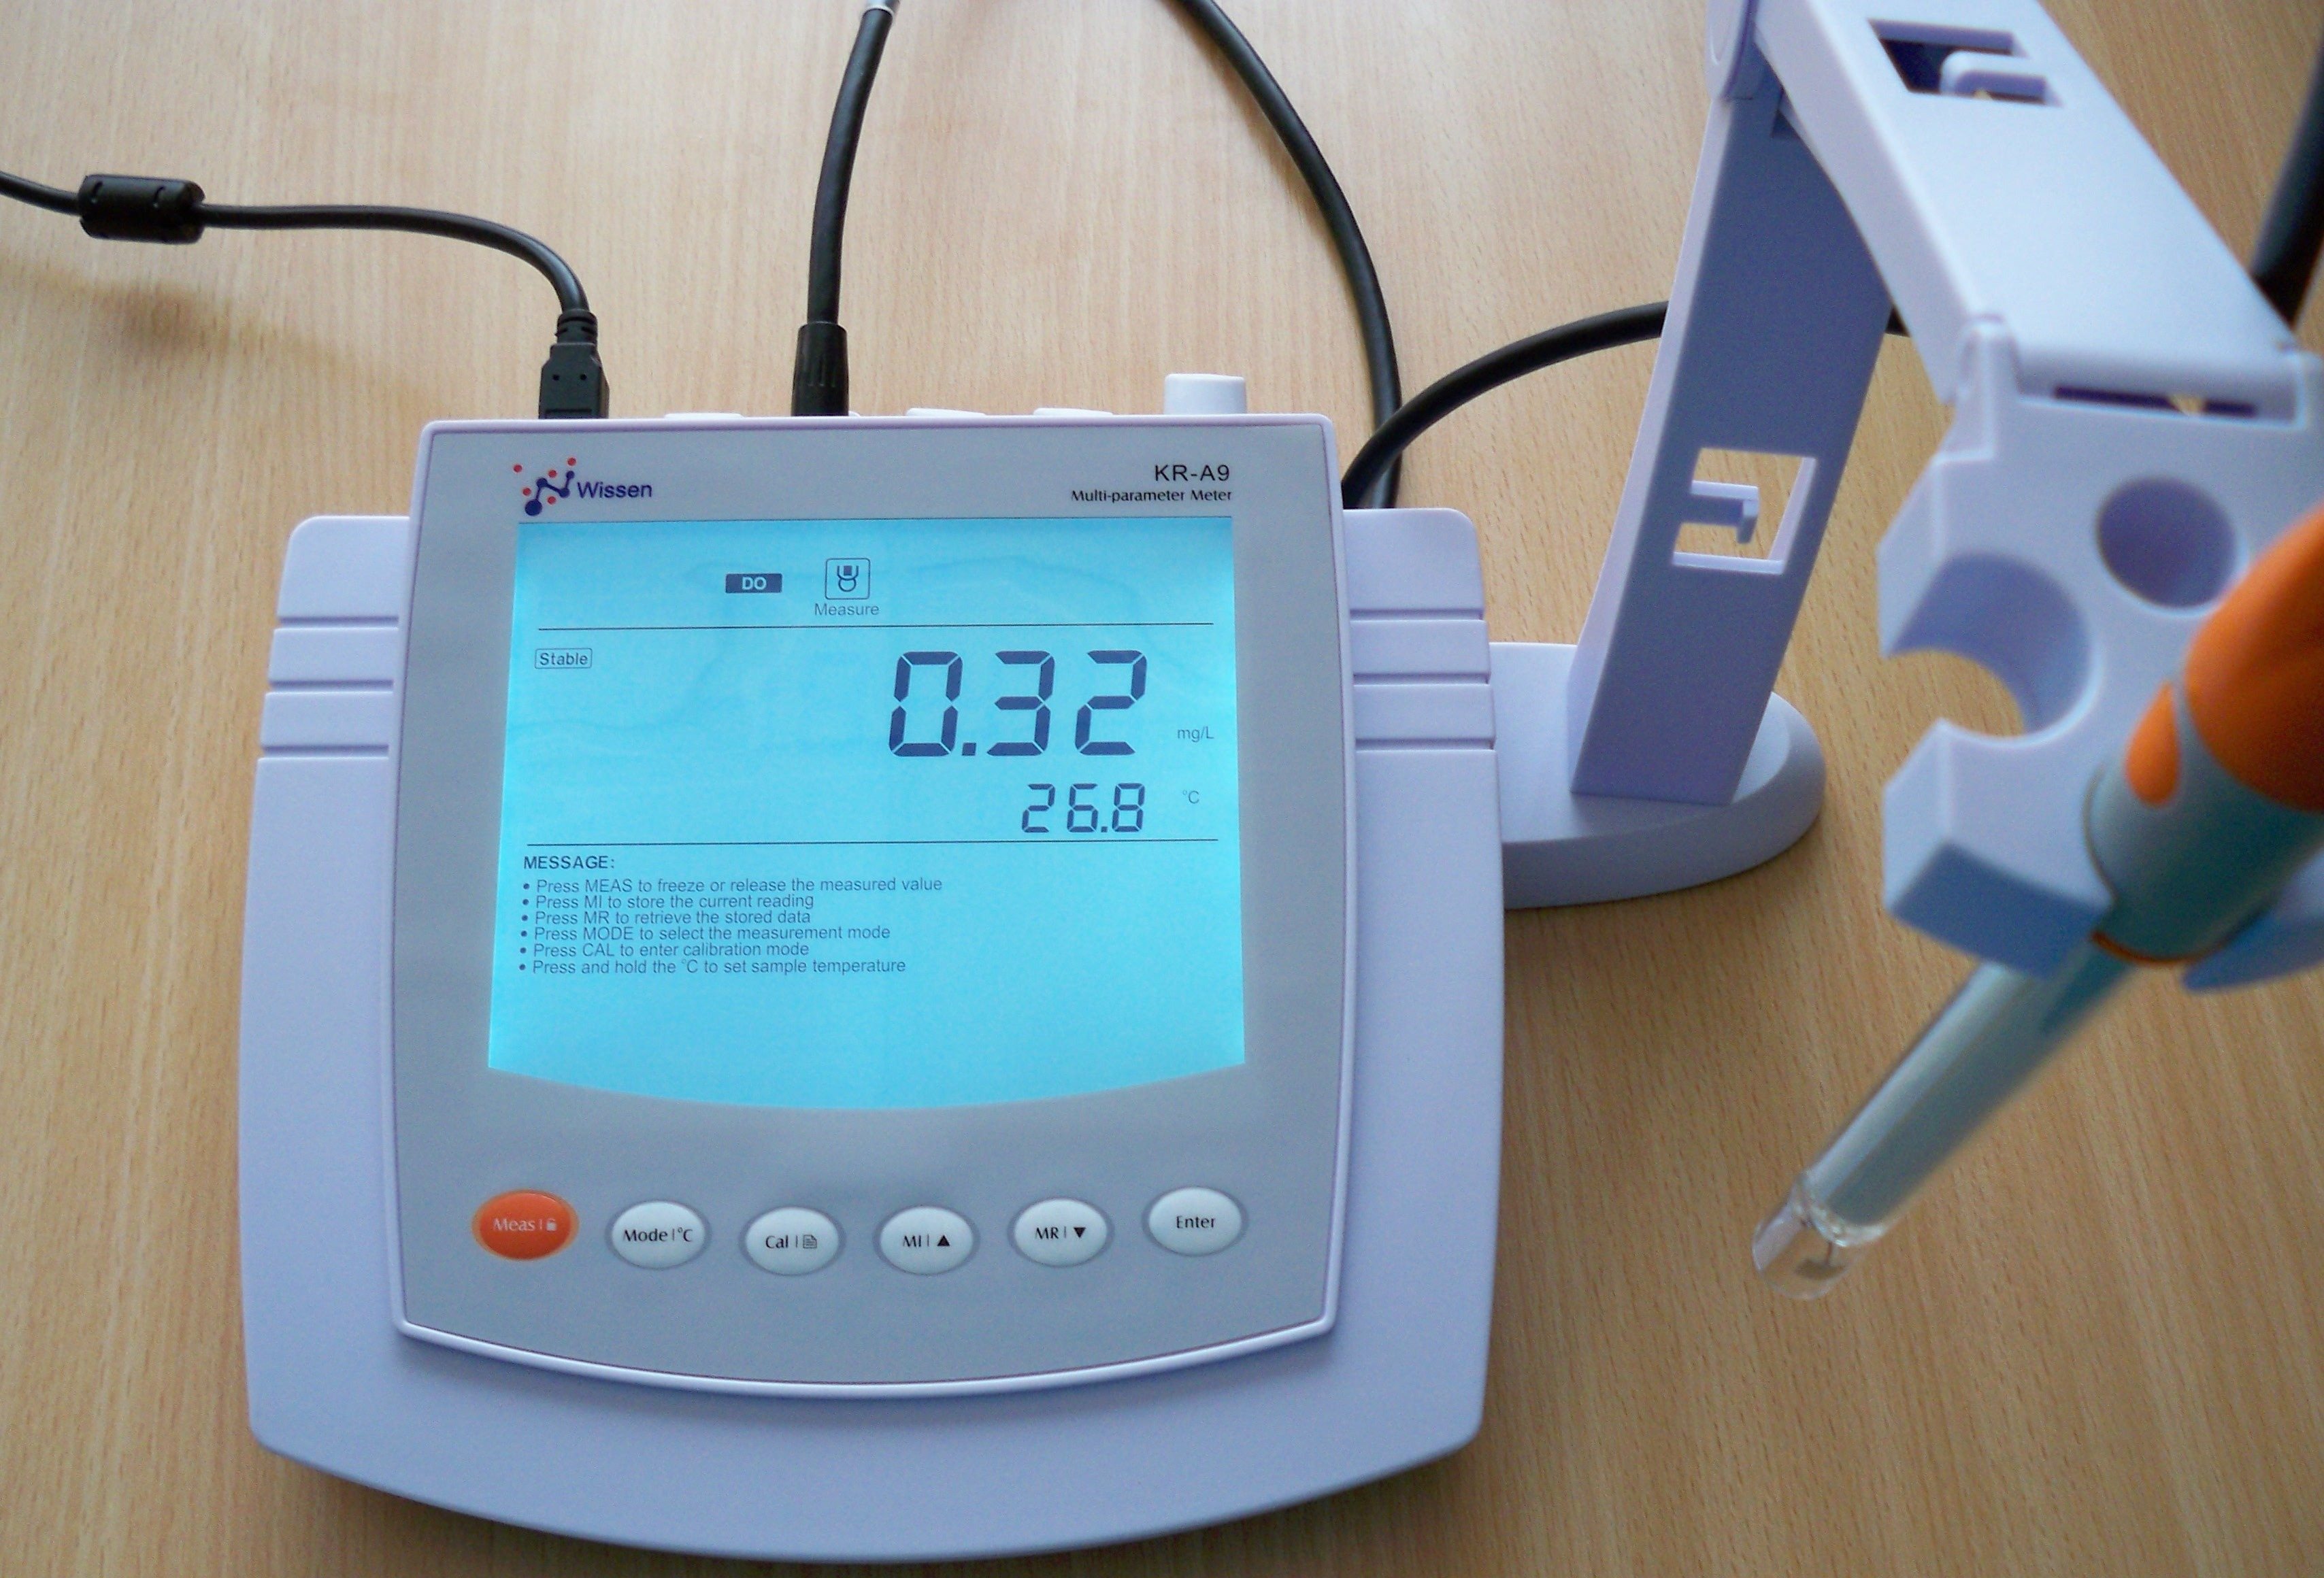 KR series multiparameter meter